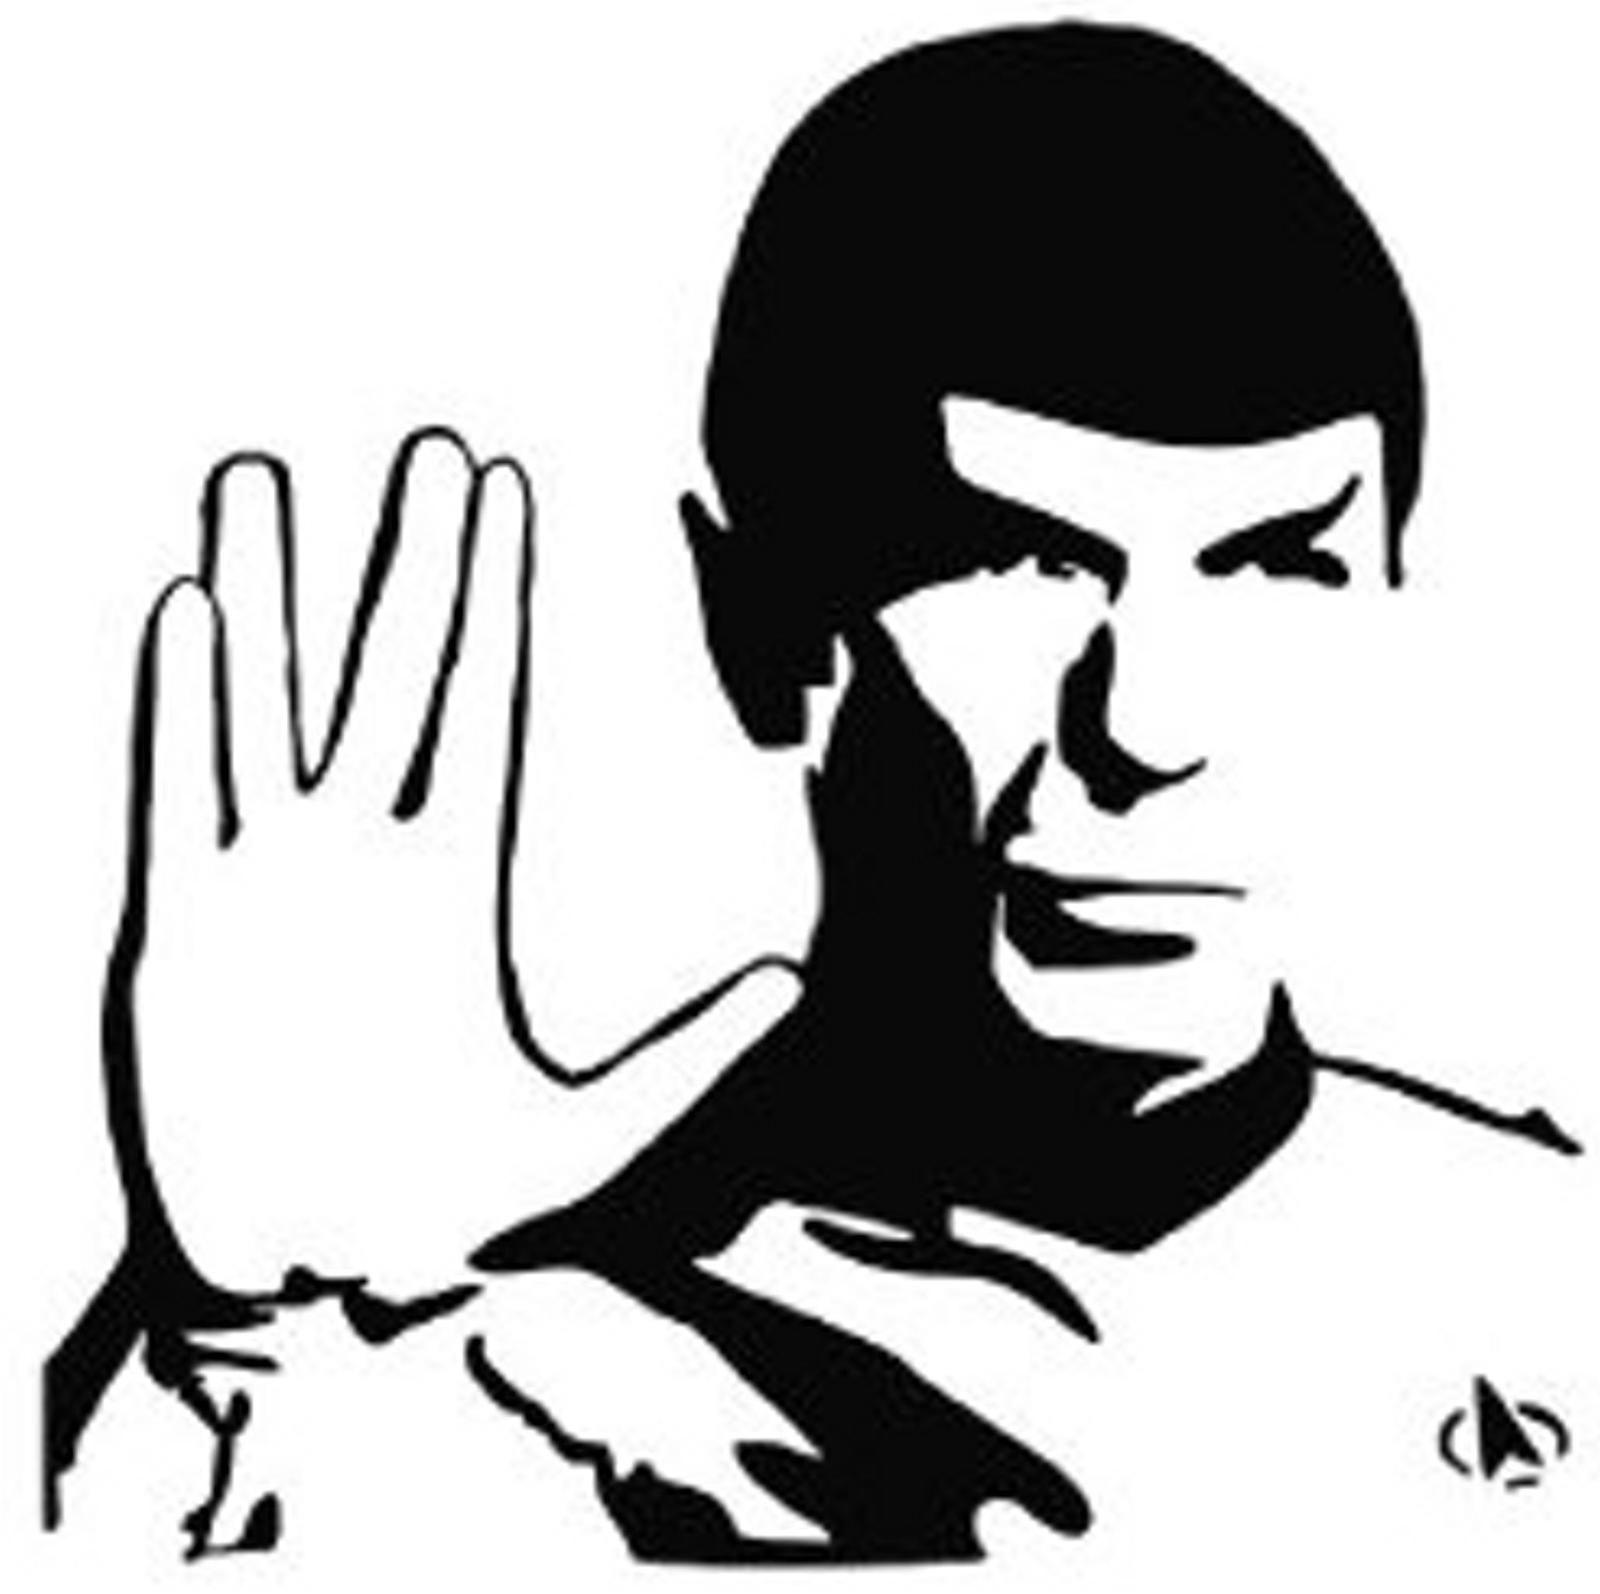 Spock Star Trek Vulcan Leonard Nimoy Decal and 50 similar items | Star trek,  Star trek spock, Spock